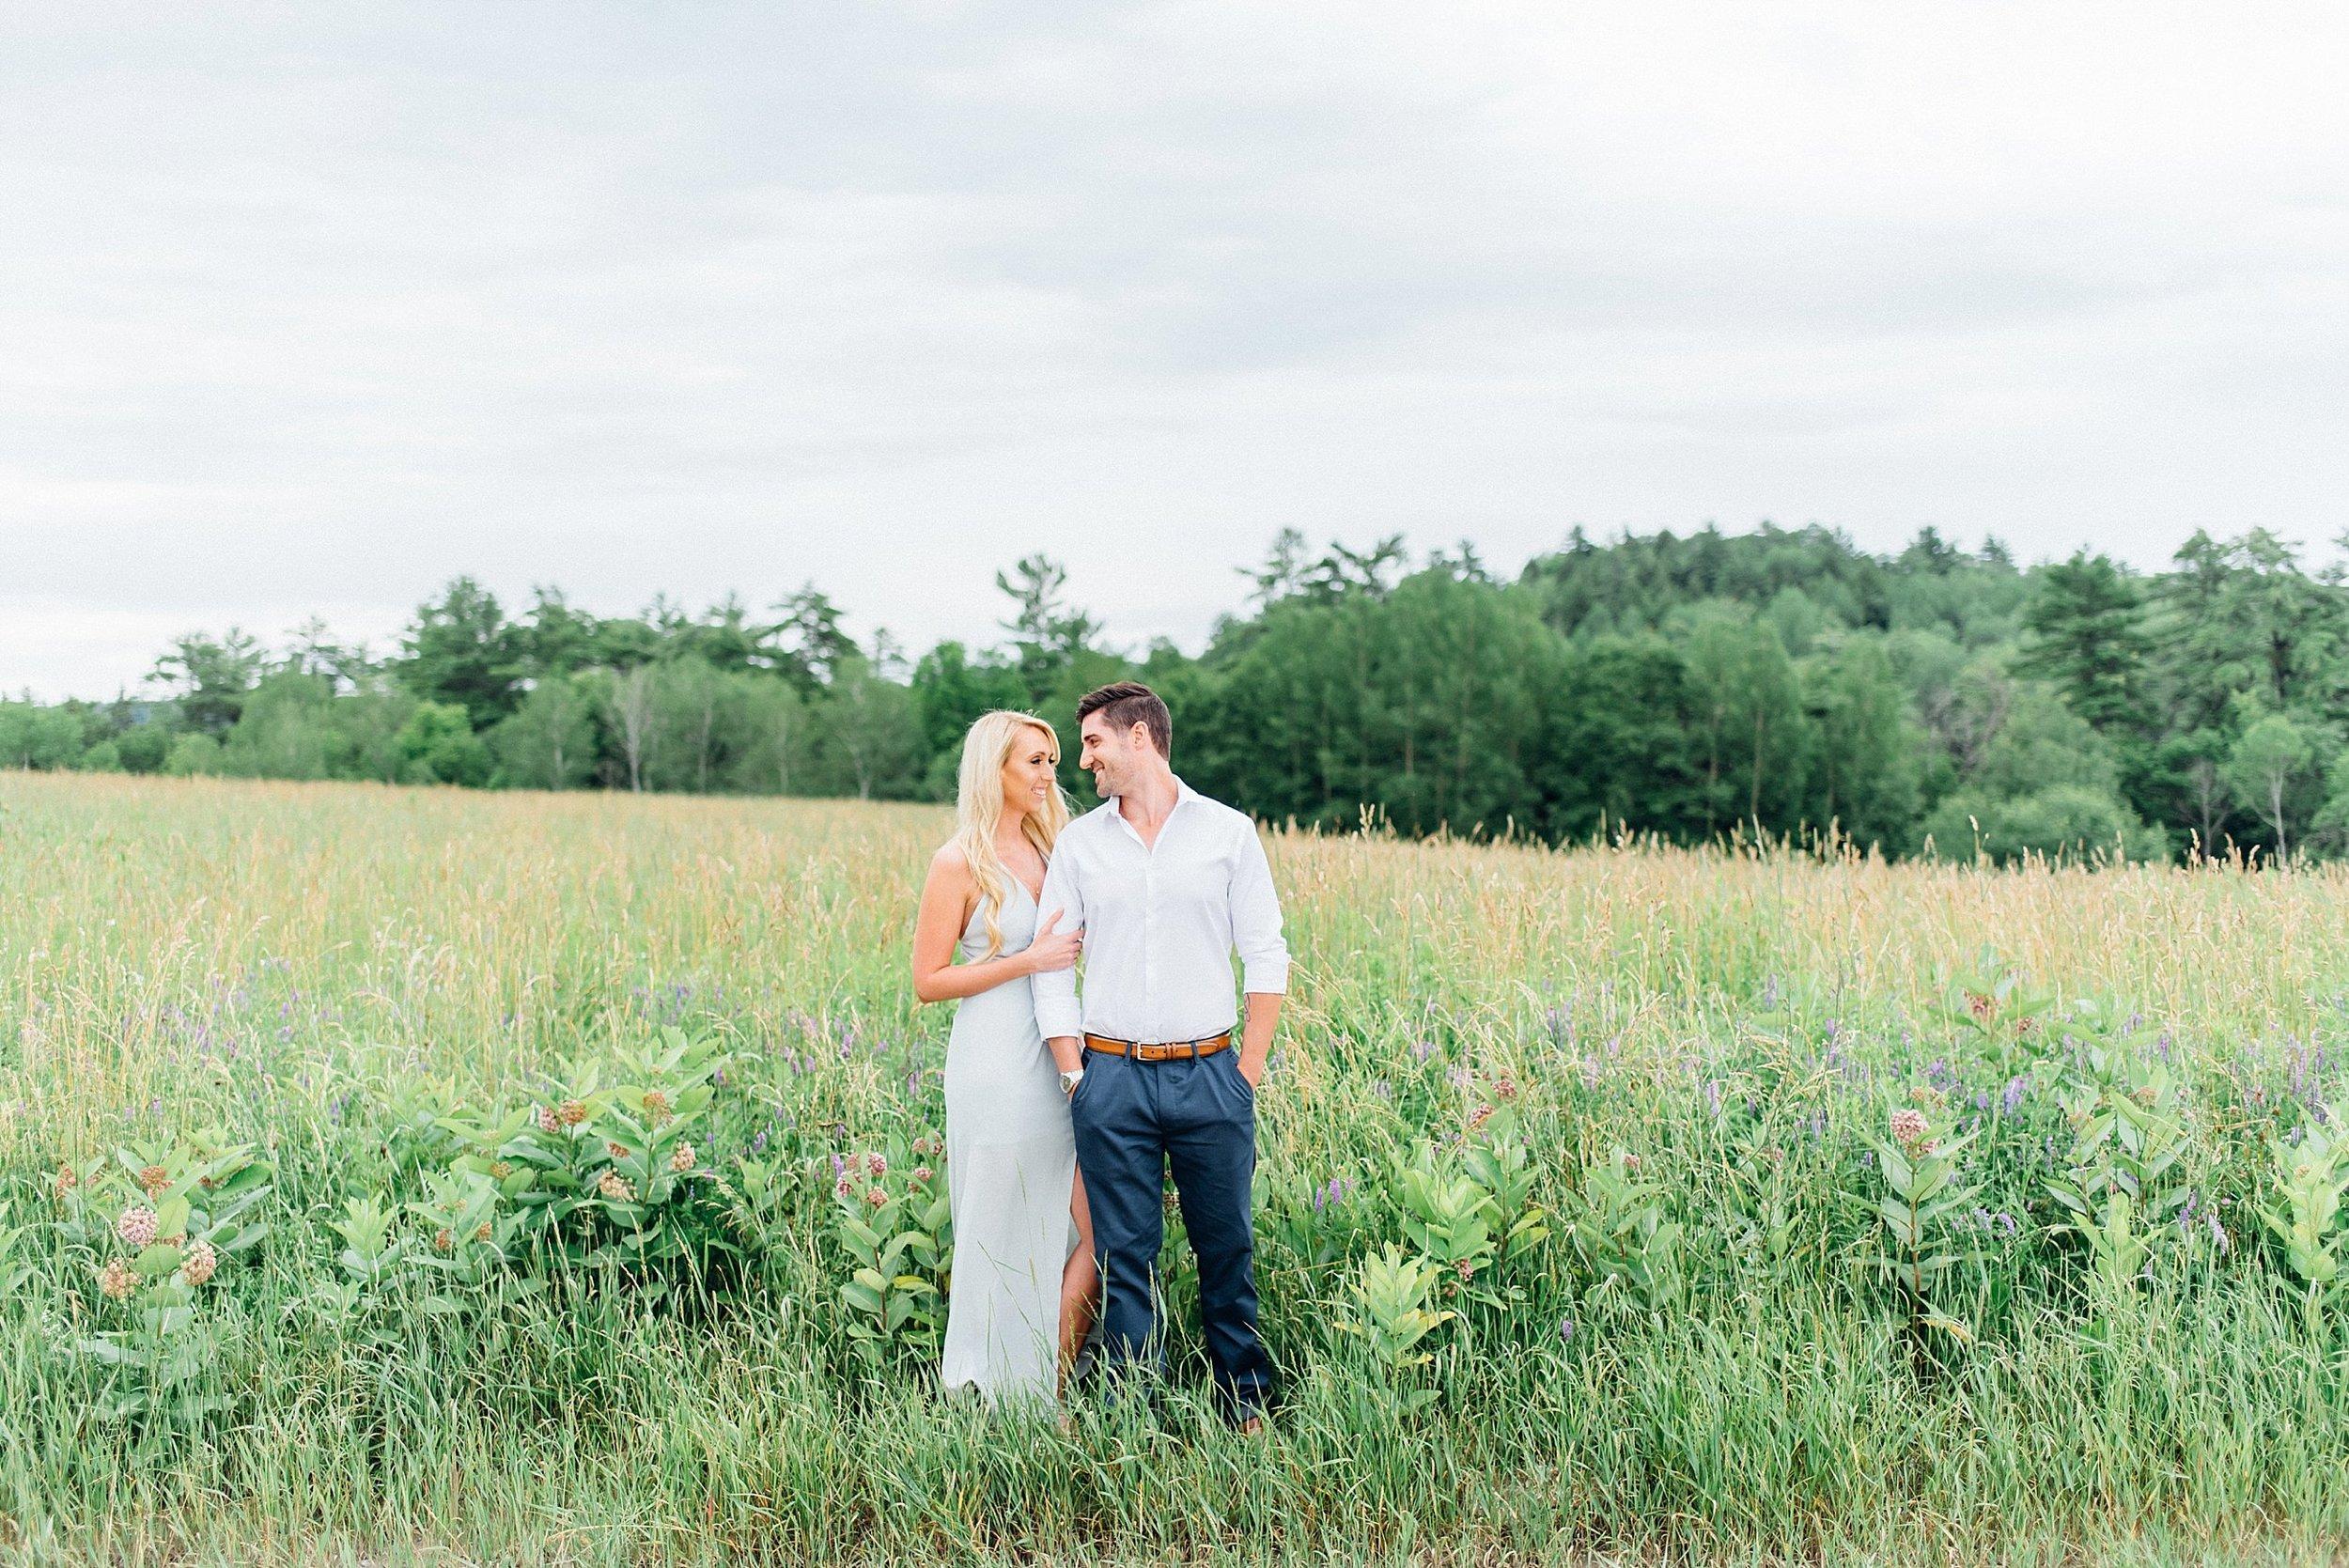 Ali and Batoul Photography - light, airy, indie documentary Ottawa wedding photographer_0028.jpg